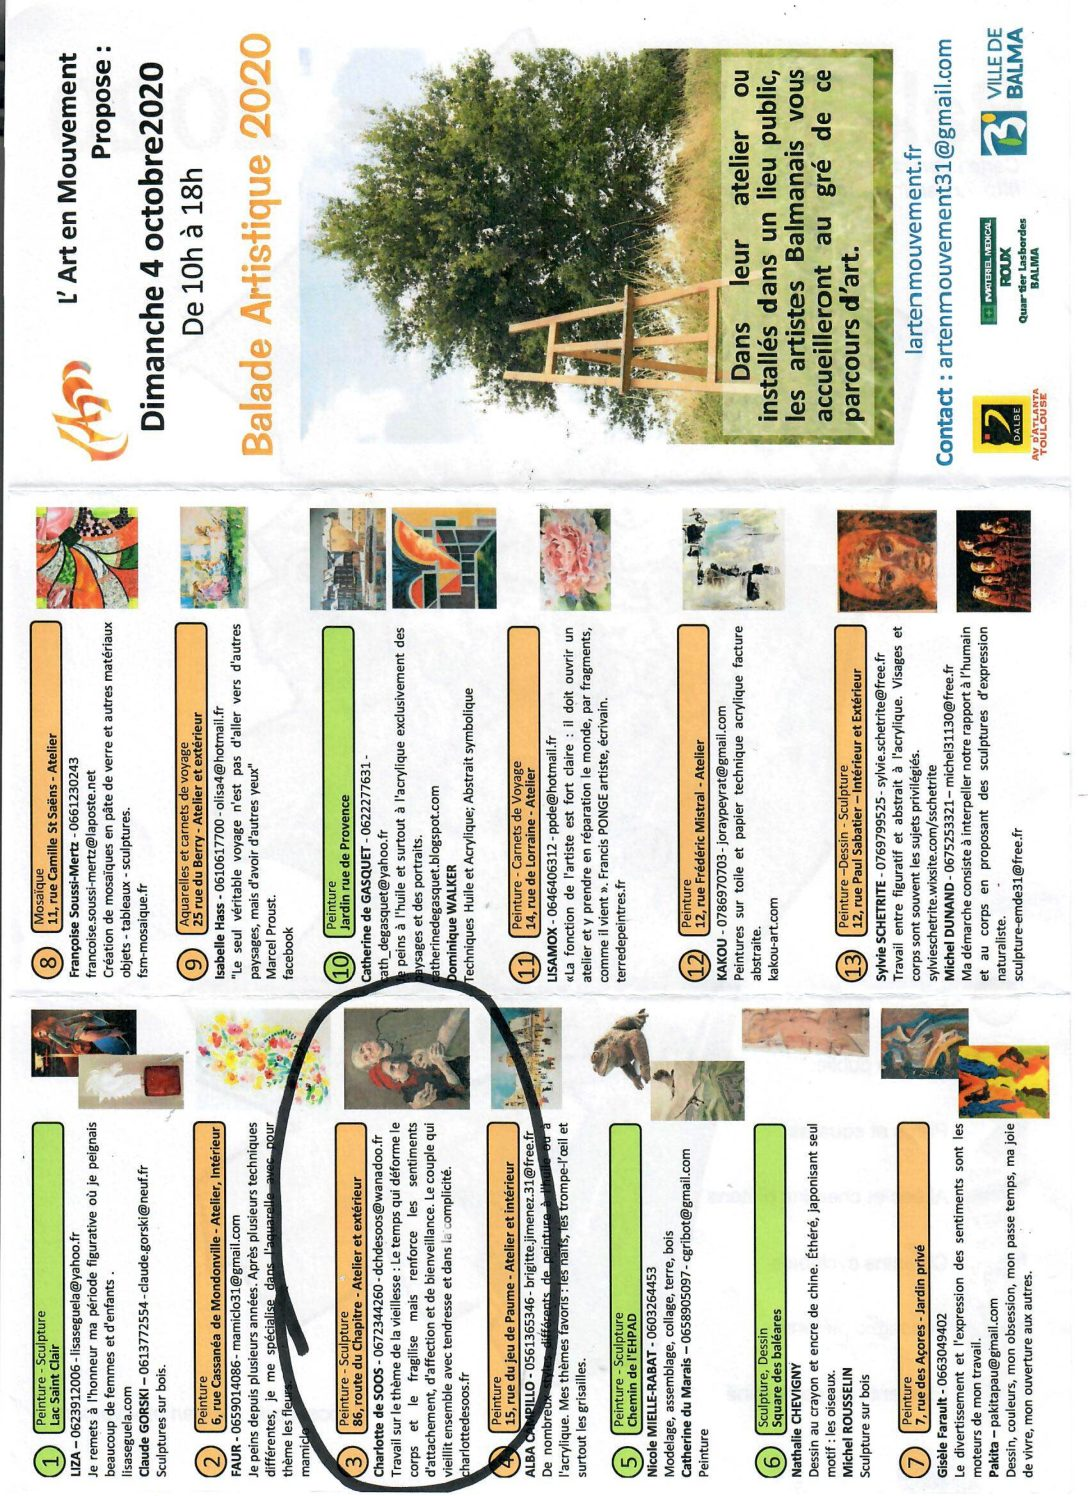 Septembre 2020 : Promenade artistique « Portes ouvertes des ateliers d'artistes de Balma »